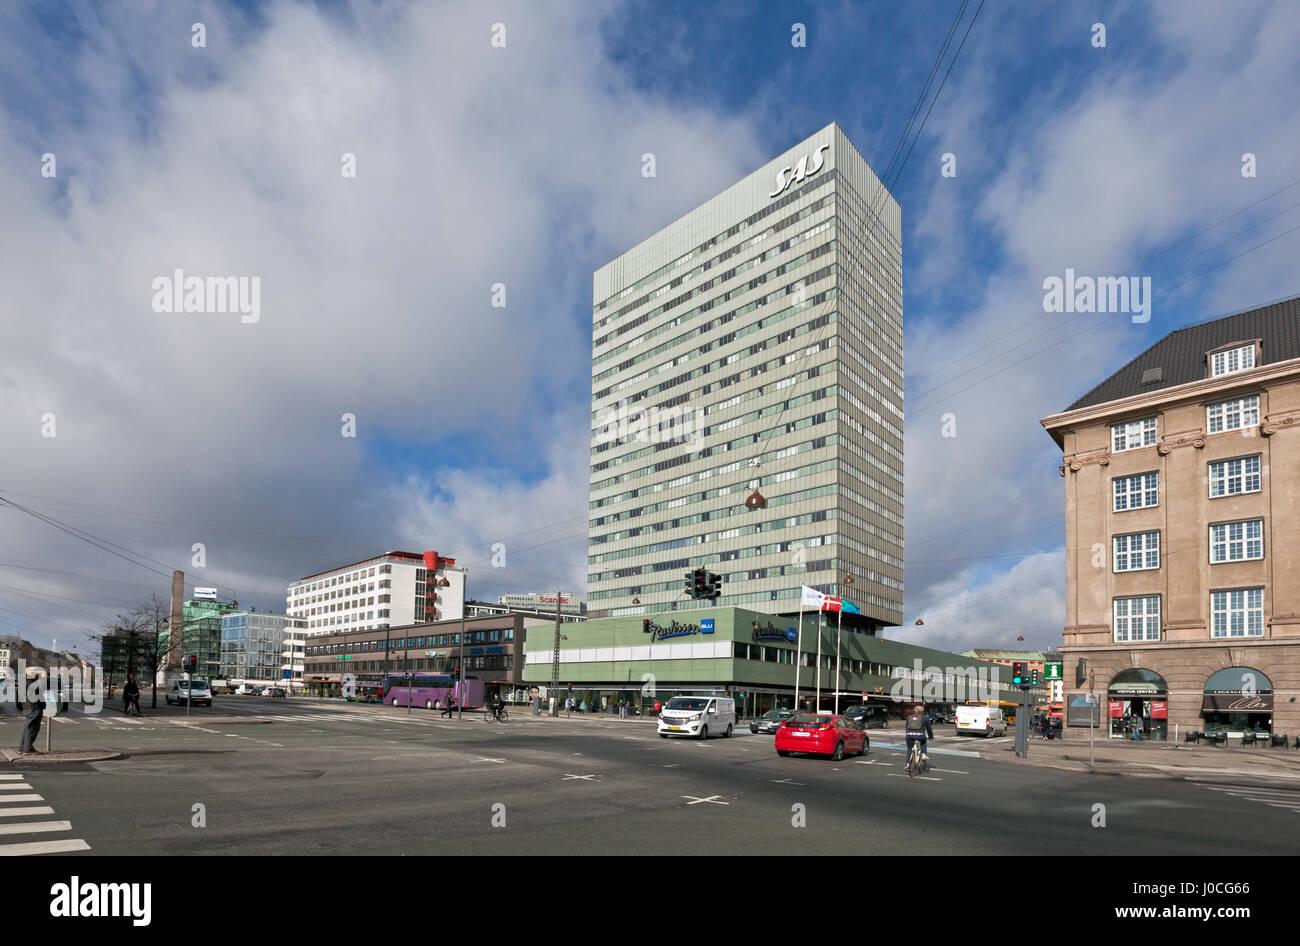 The Radisson Blu Royal Hotel, or just the SAS Hotel, at Vesterbrogade in Copenhagen, Denmark. - Stock Image